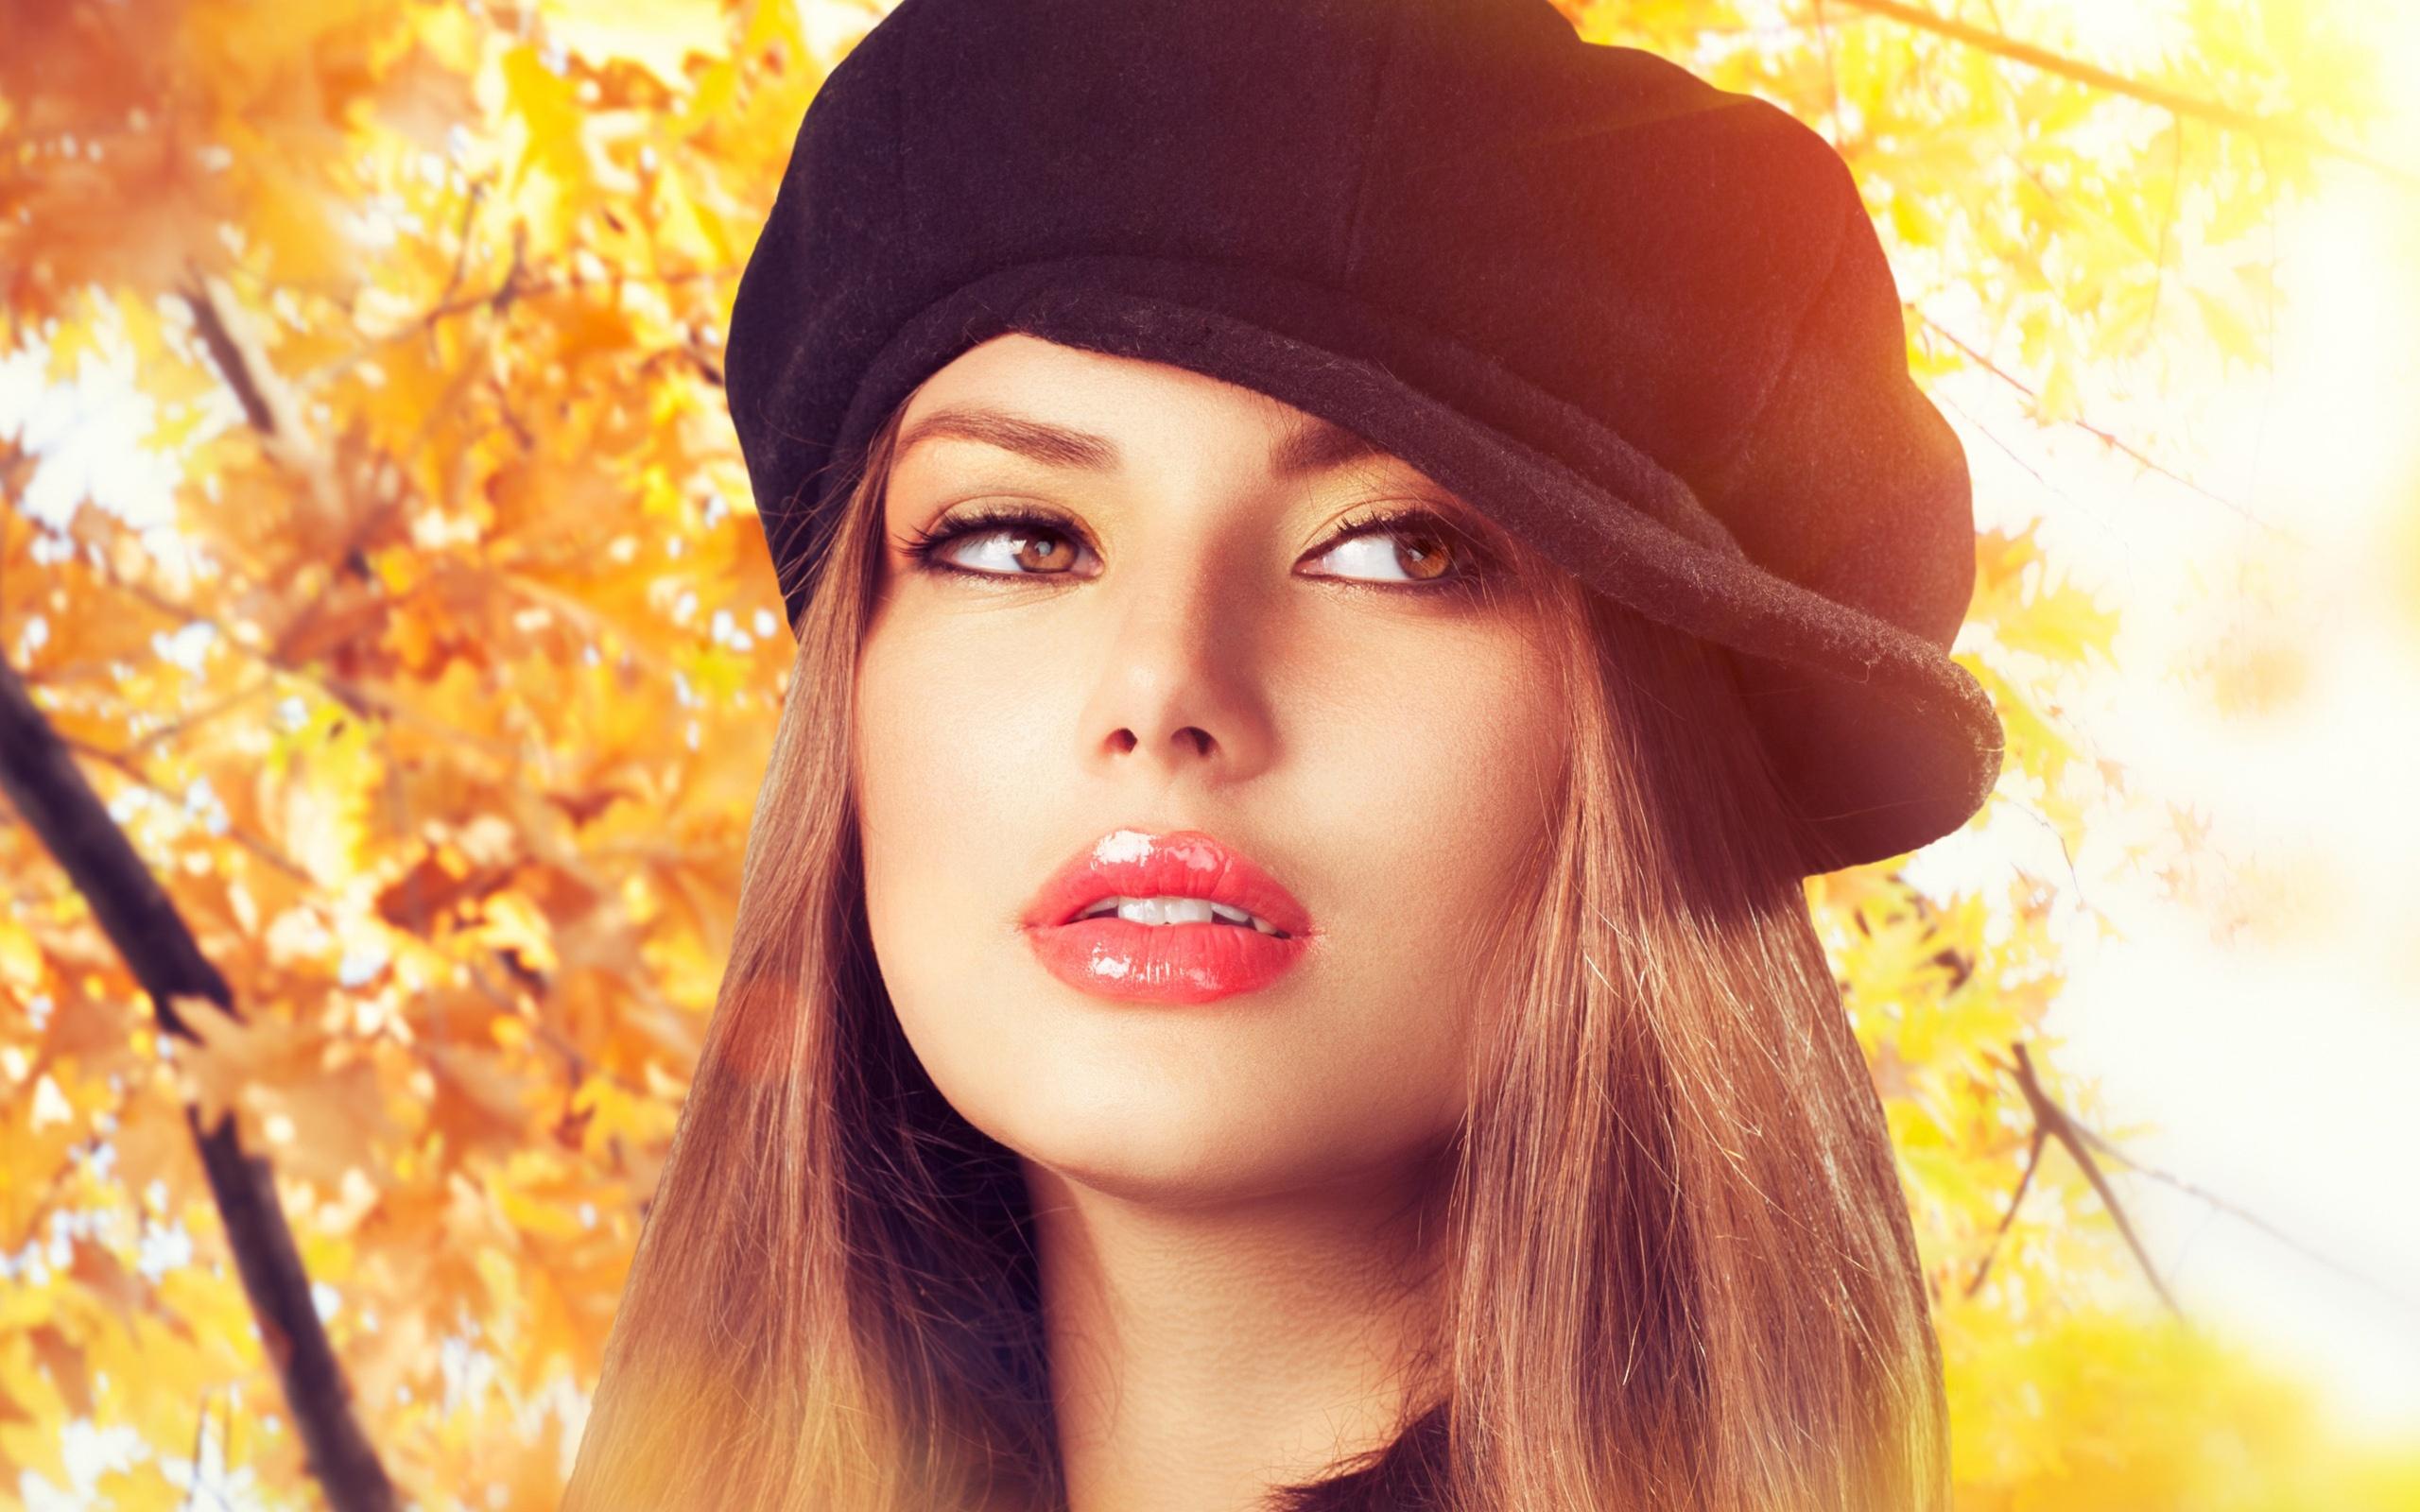 Best beautiful girl photo